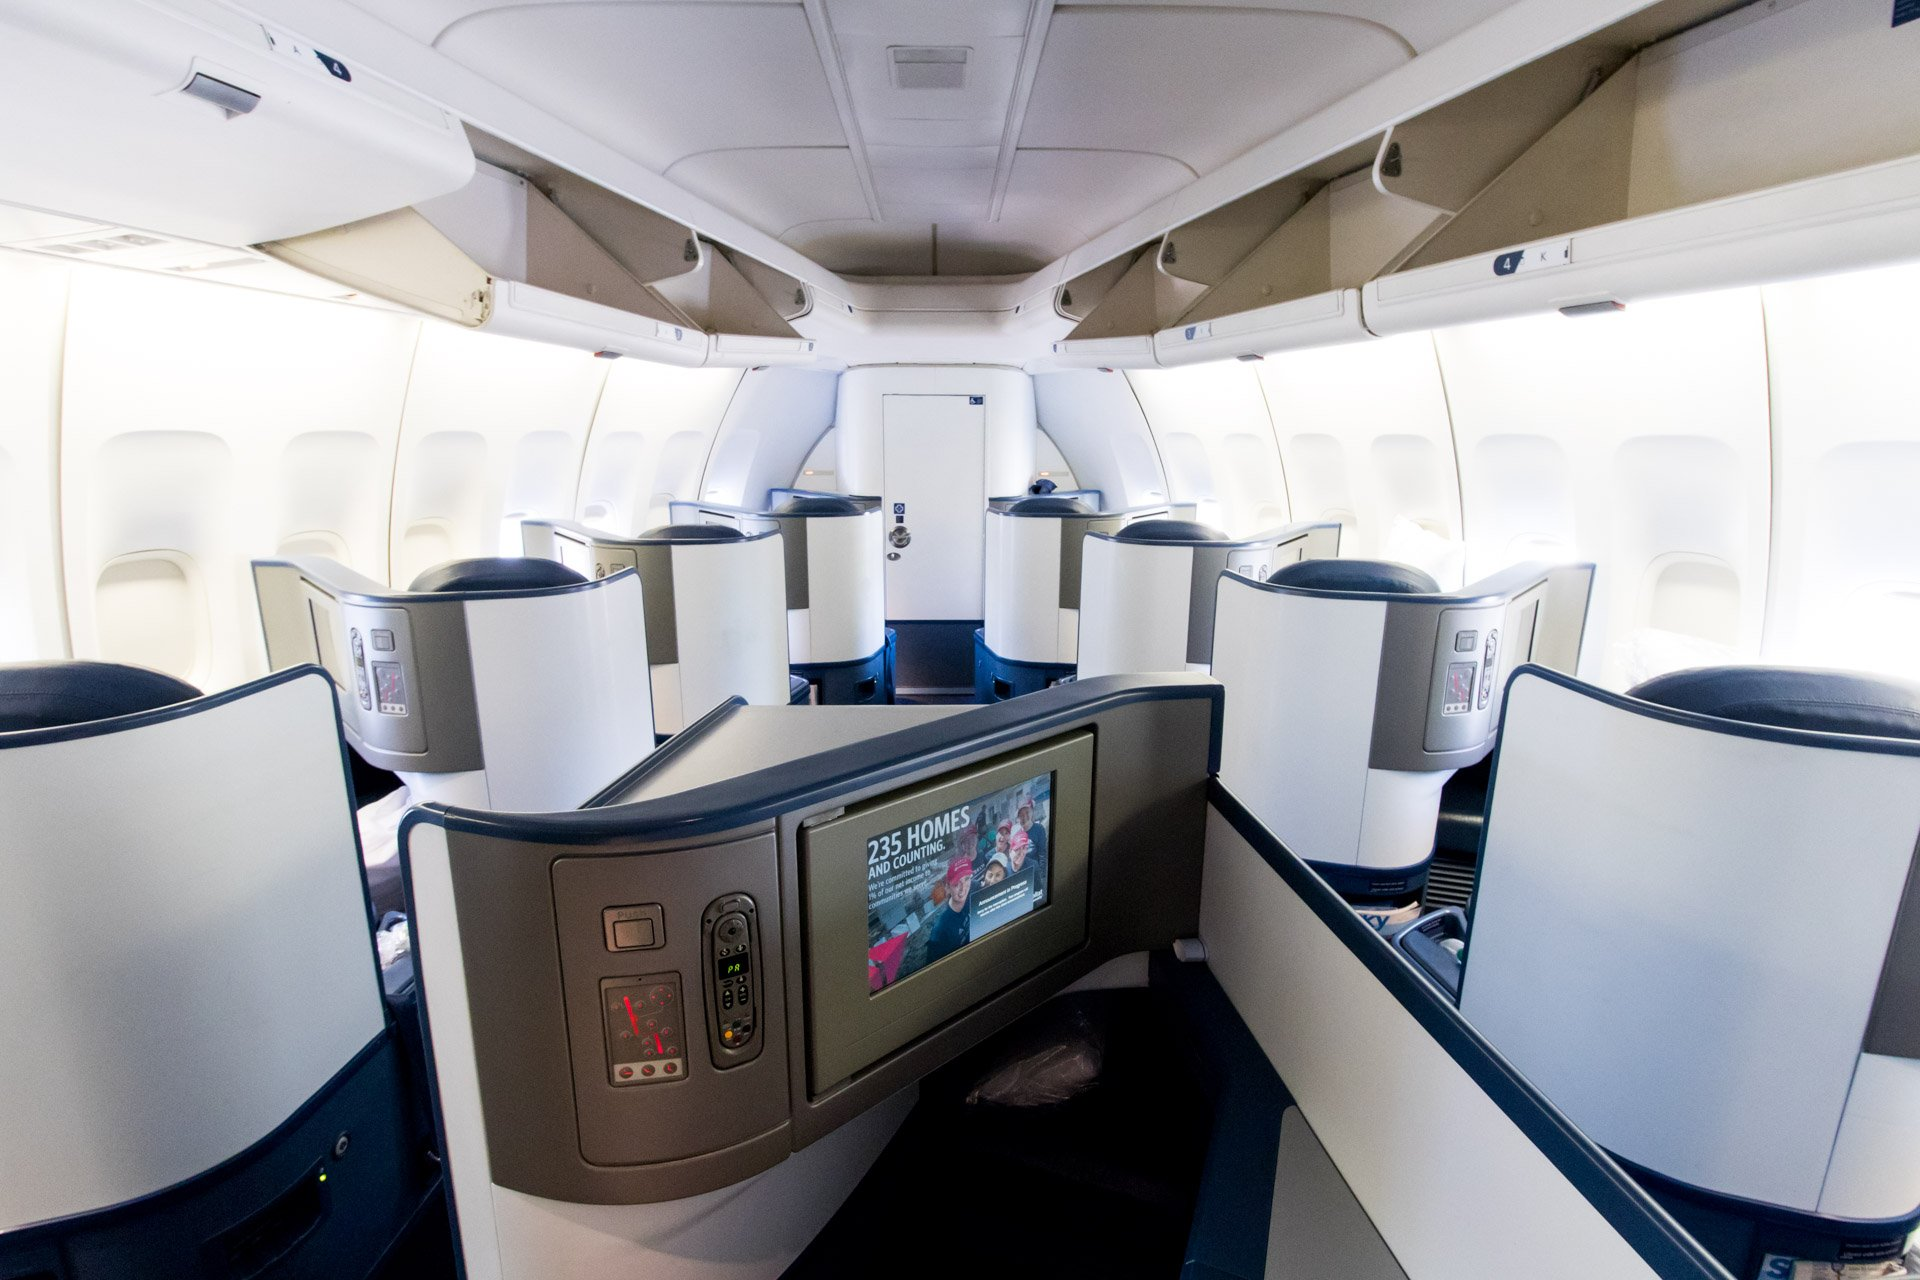 Flight Report: Delta Air Lines 747-400 from Detroit to Tokyo Narita